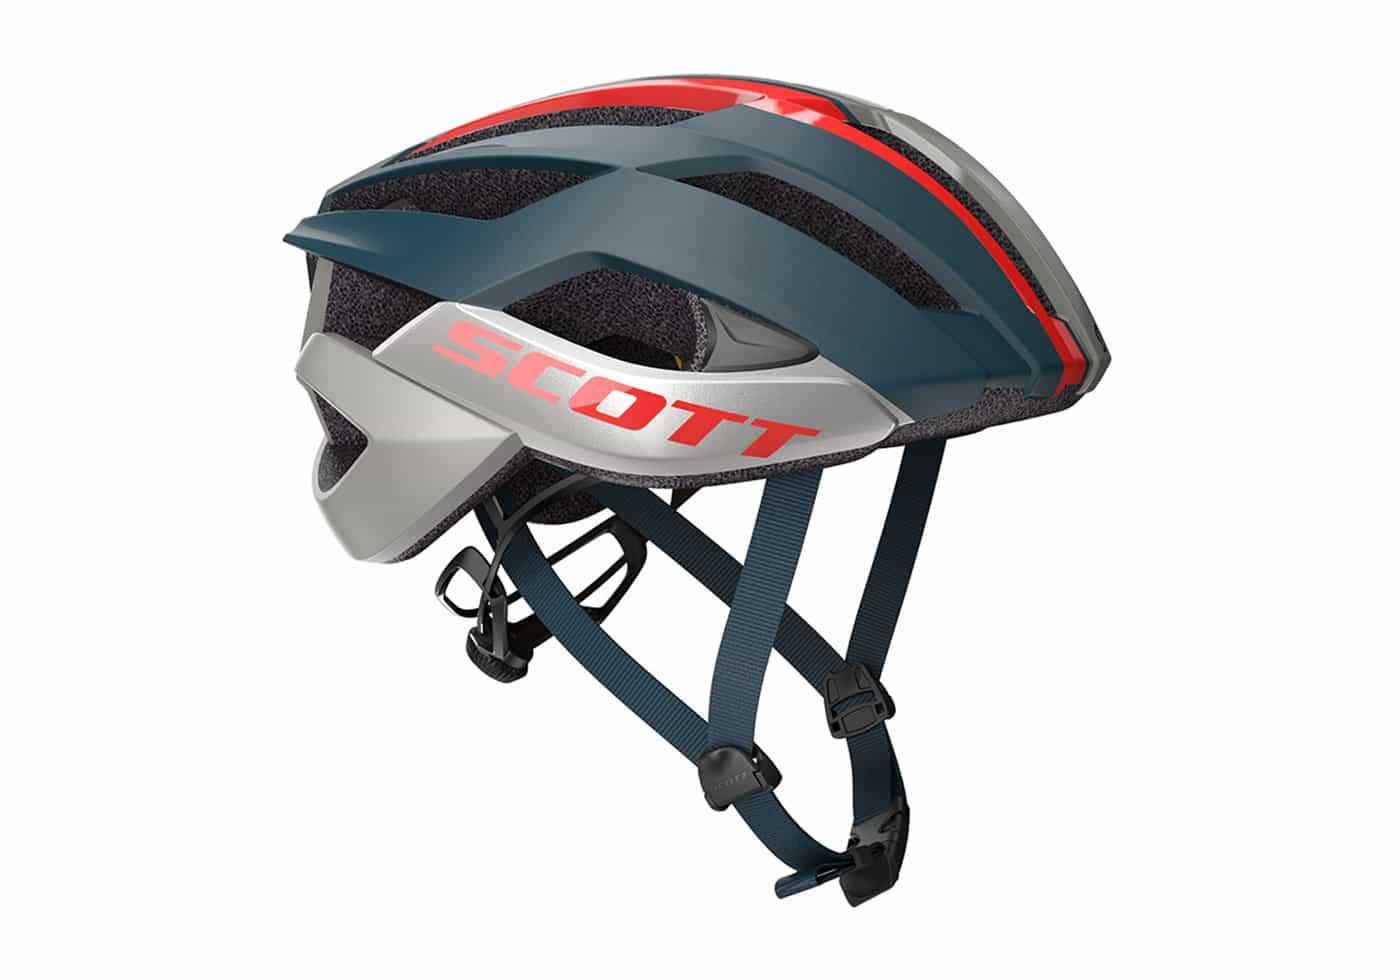 SCOTT Arx 2020 Color Gris y Rojo Casco para Bicicleta